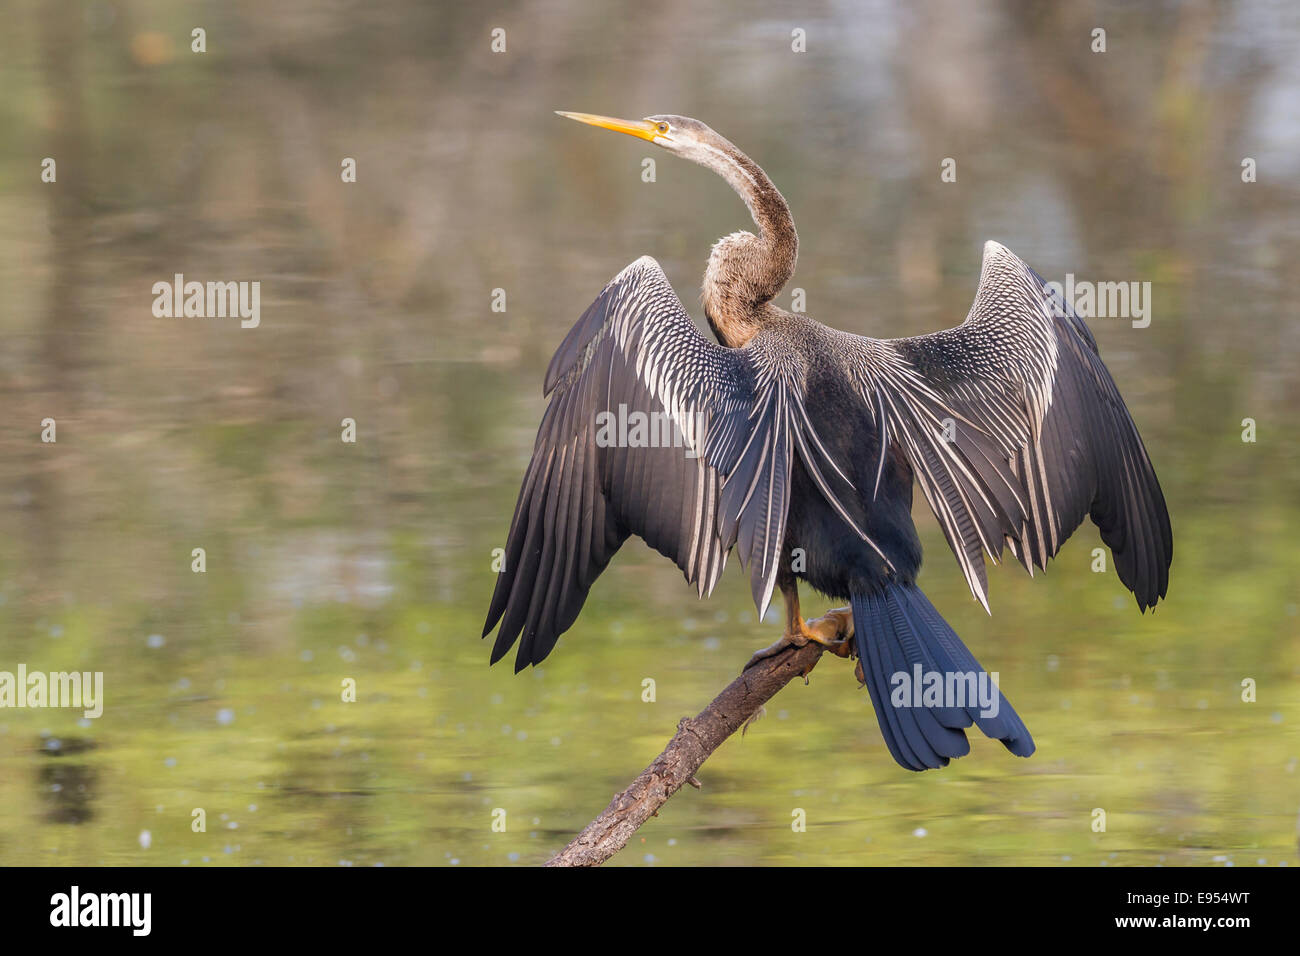 Oriental Darter (Anhinga melanogaster), Keoladeo National Park, Rajasthan, India - Stock Image